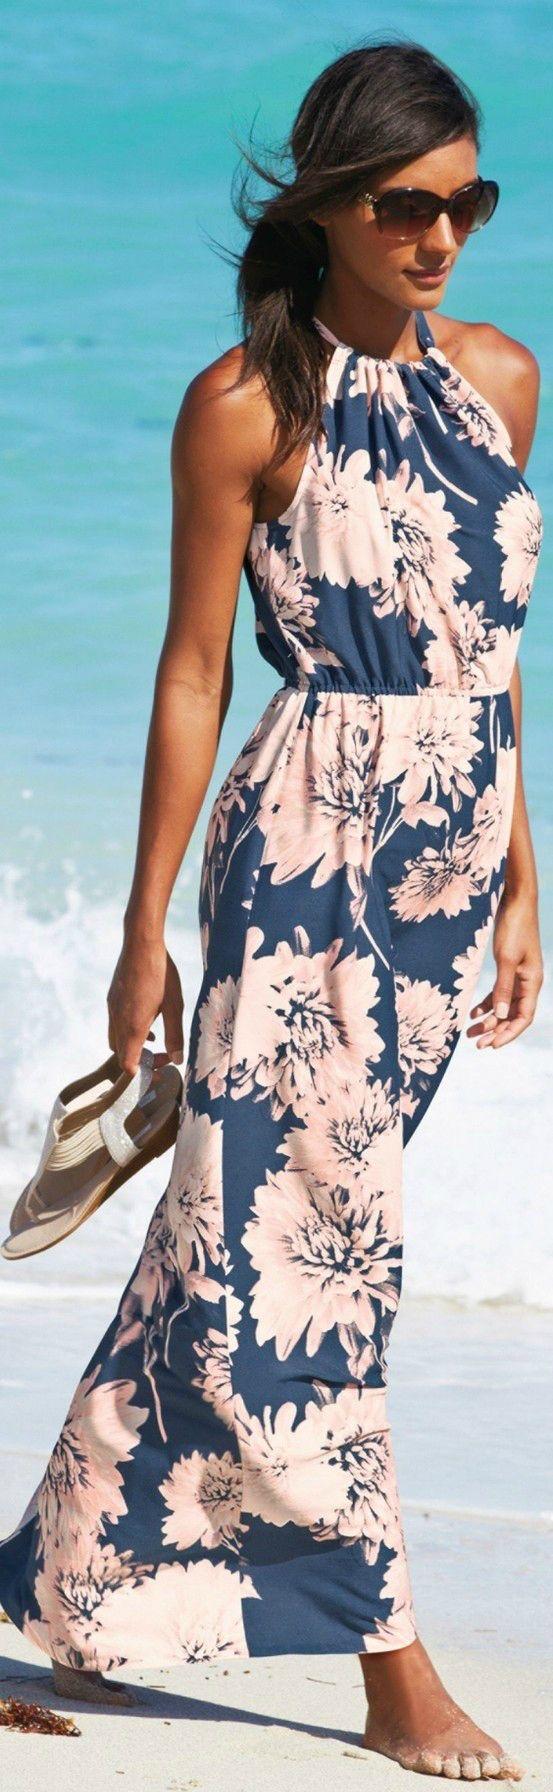 Fashion & Style Summer 2014